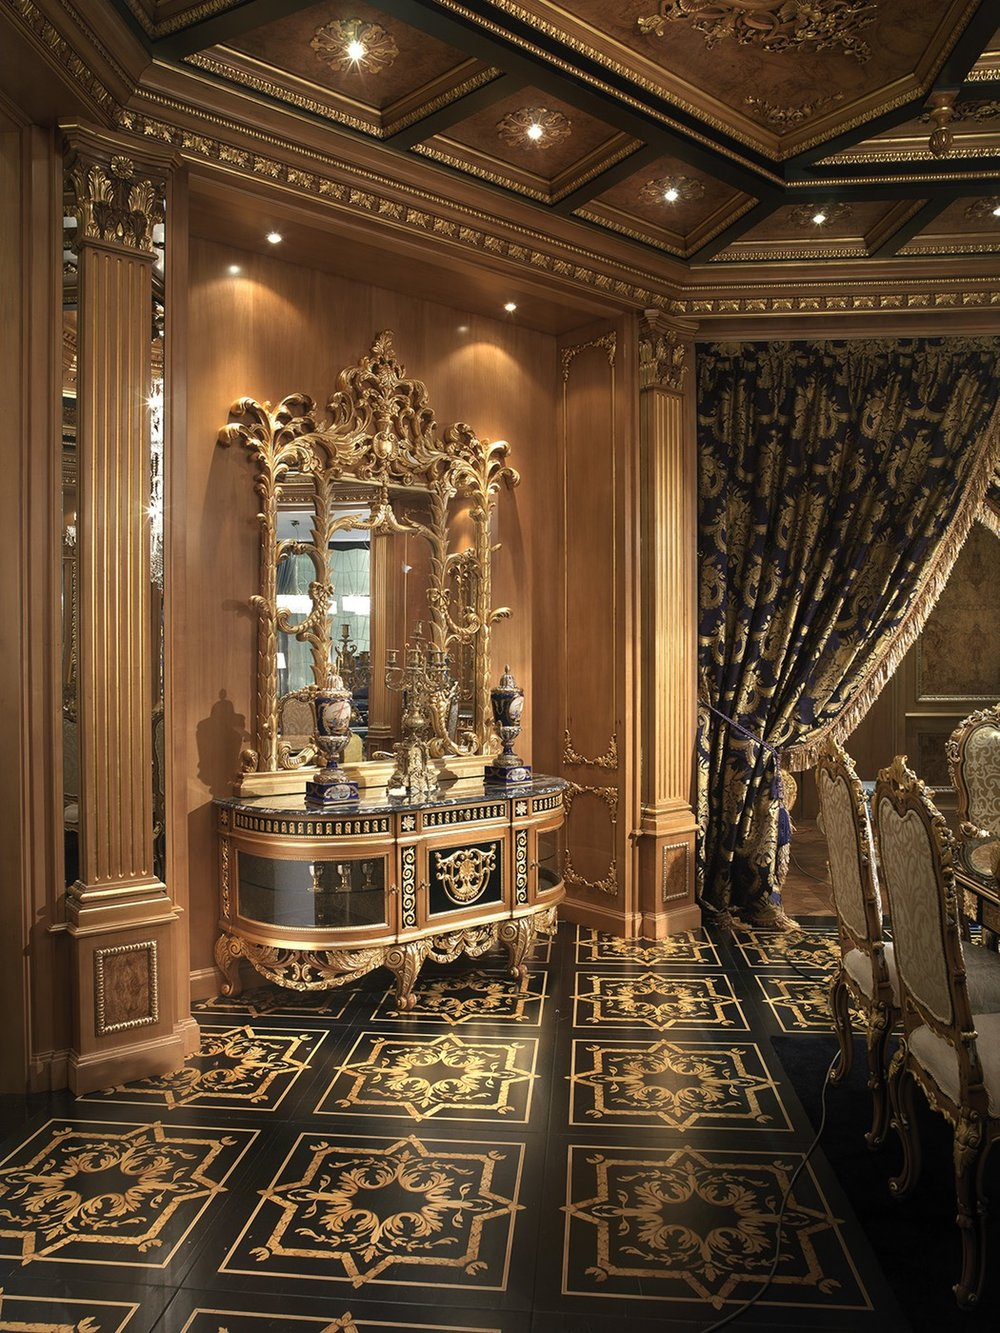 francesco-molon-portfolio-architecture-interiors-neoclassical-neoclassical-dining-room.jpg